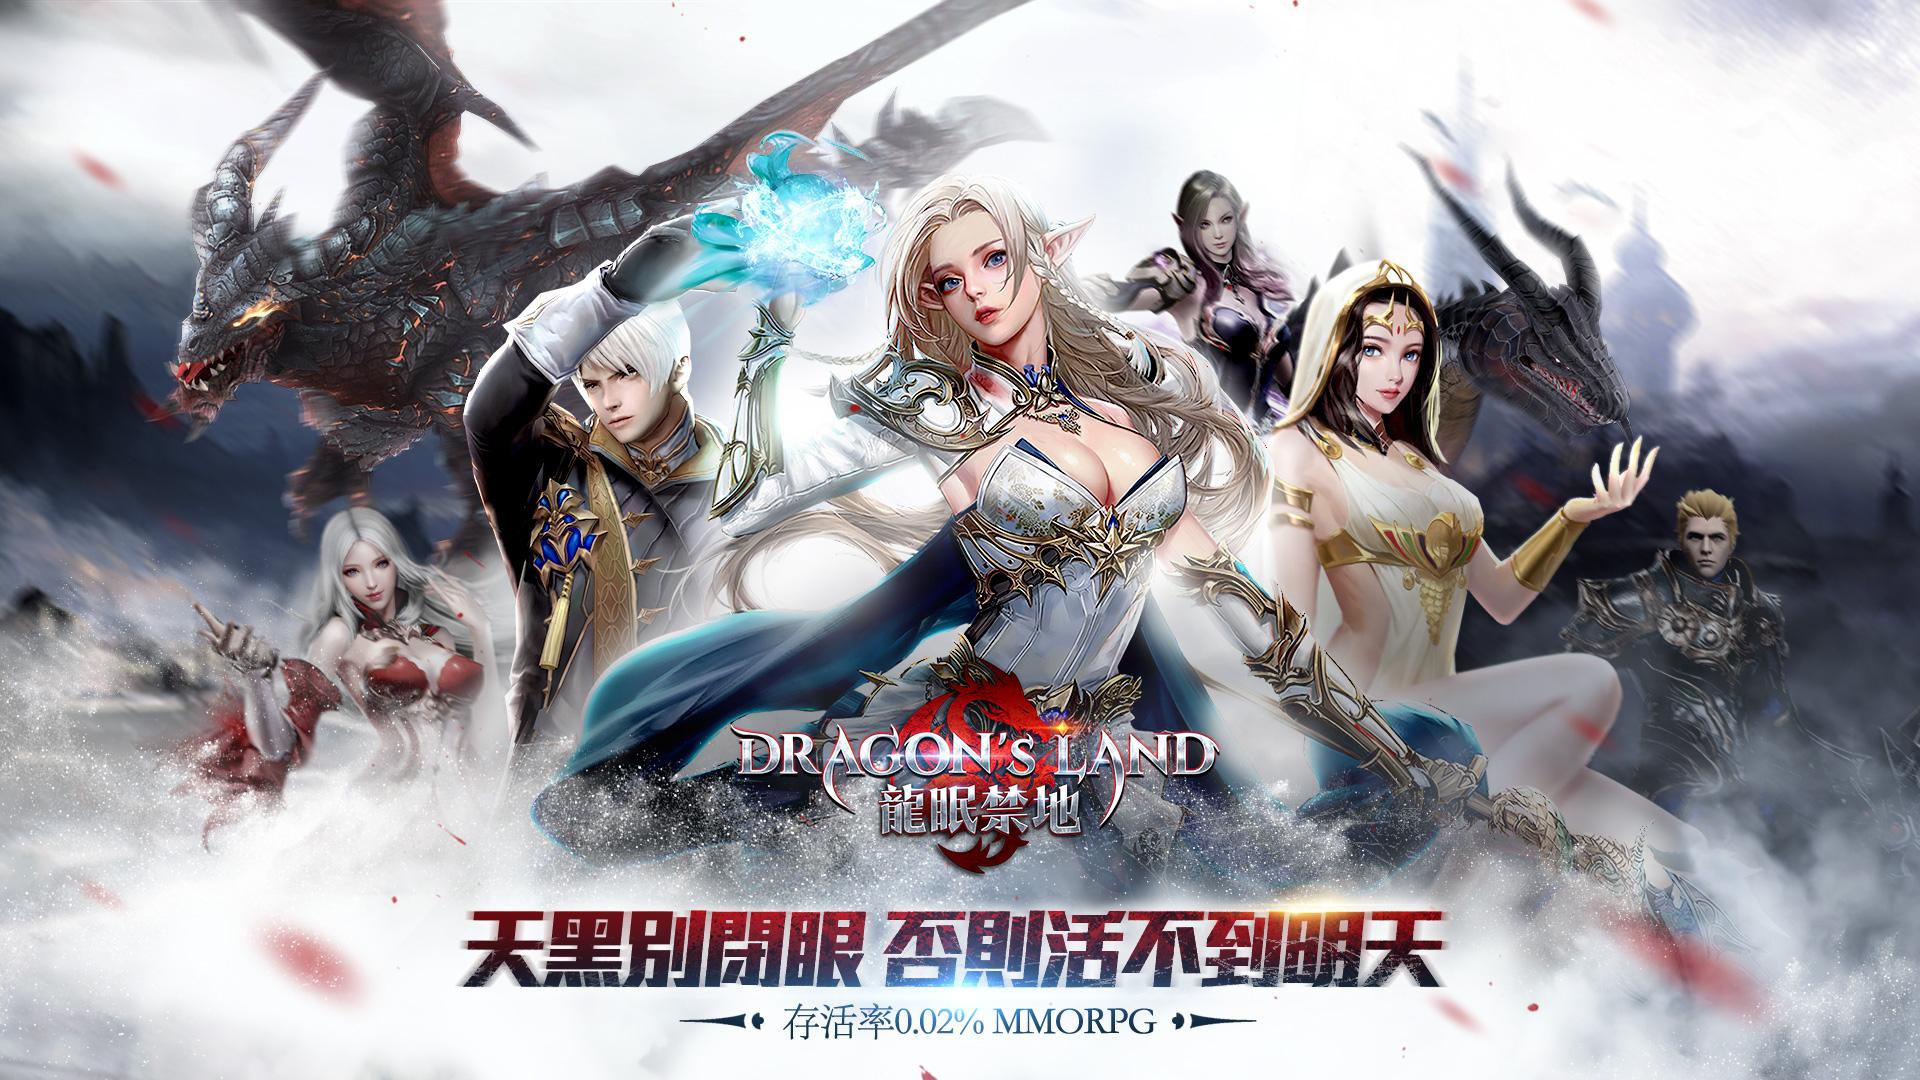 《DRAGON'S LAND 龍眠禁地》以龍為世界觀存活率0.02% MMORPG 正式開啟事前登錄活動